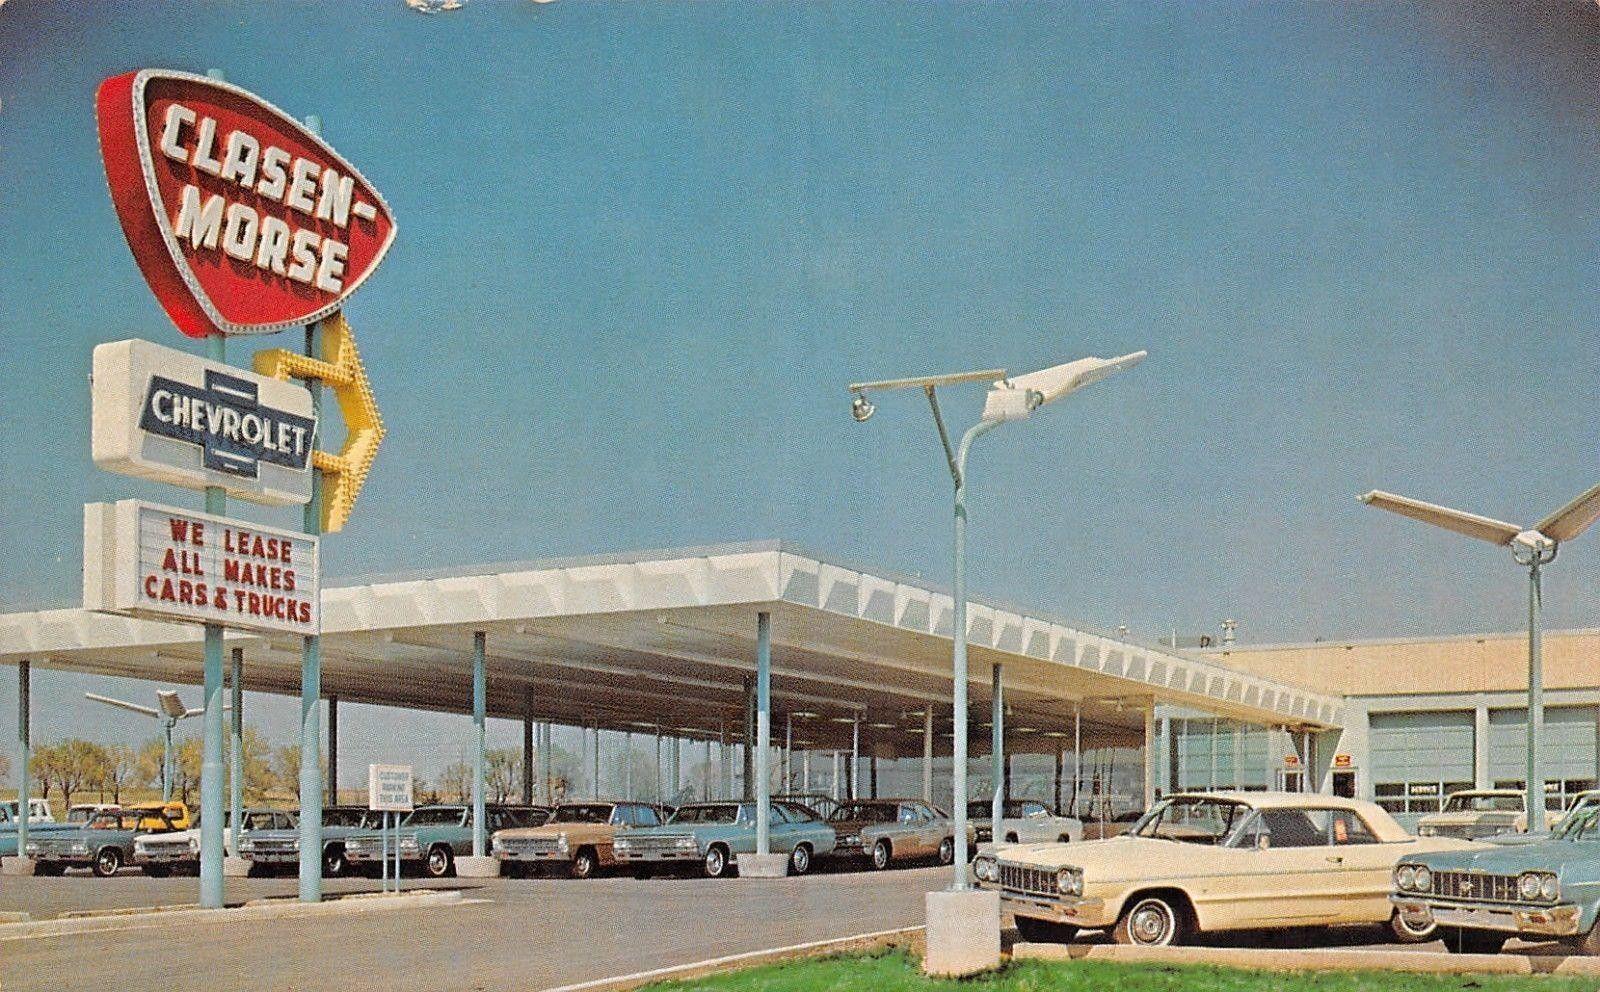 1964 Clasen Morse Chevrolet Inc Dealership Overland Park Kansas Car Dealership Overland Park Chevrolet